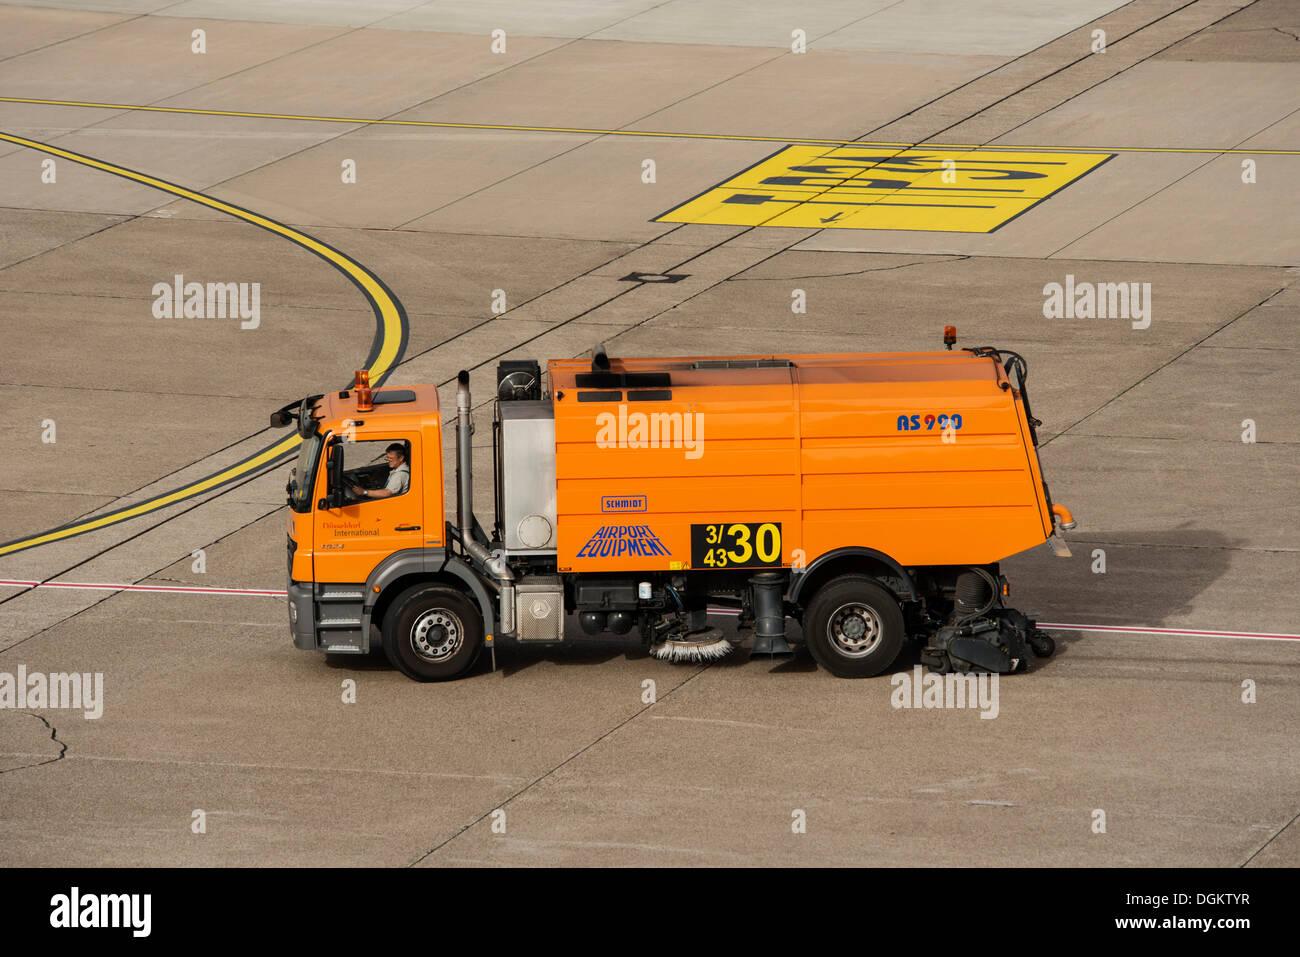 Sweeper in action on the runway, Duesseldorf International Airport, North Rhine-Westphalia - Stock Image